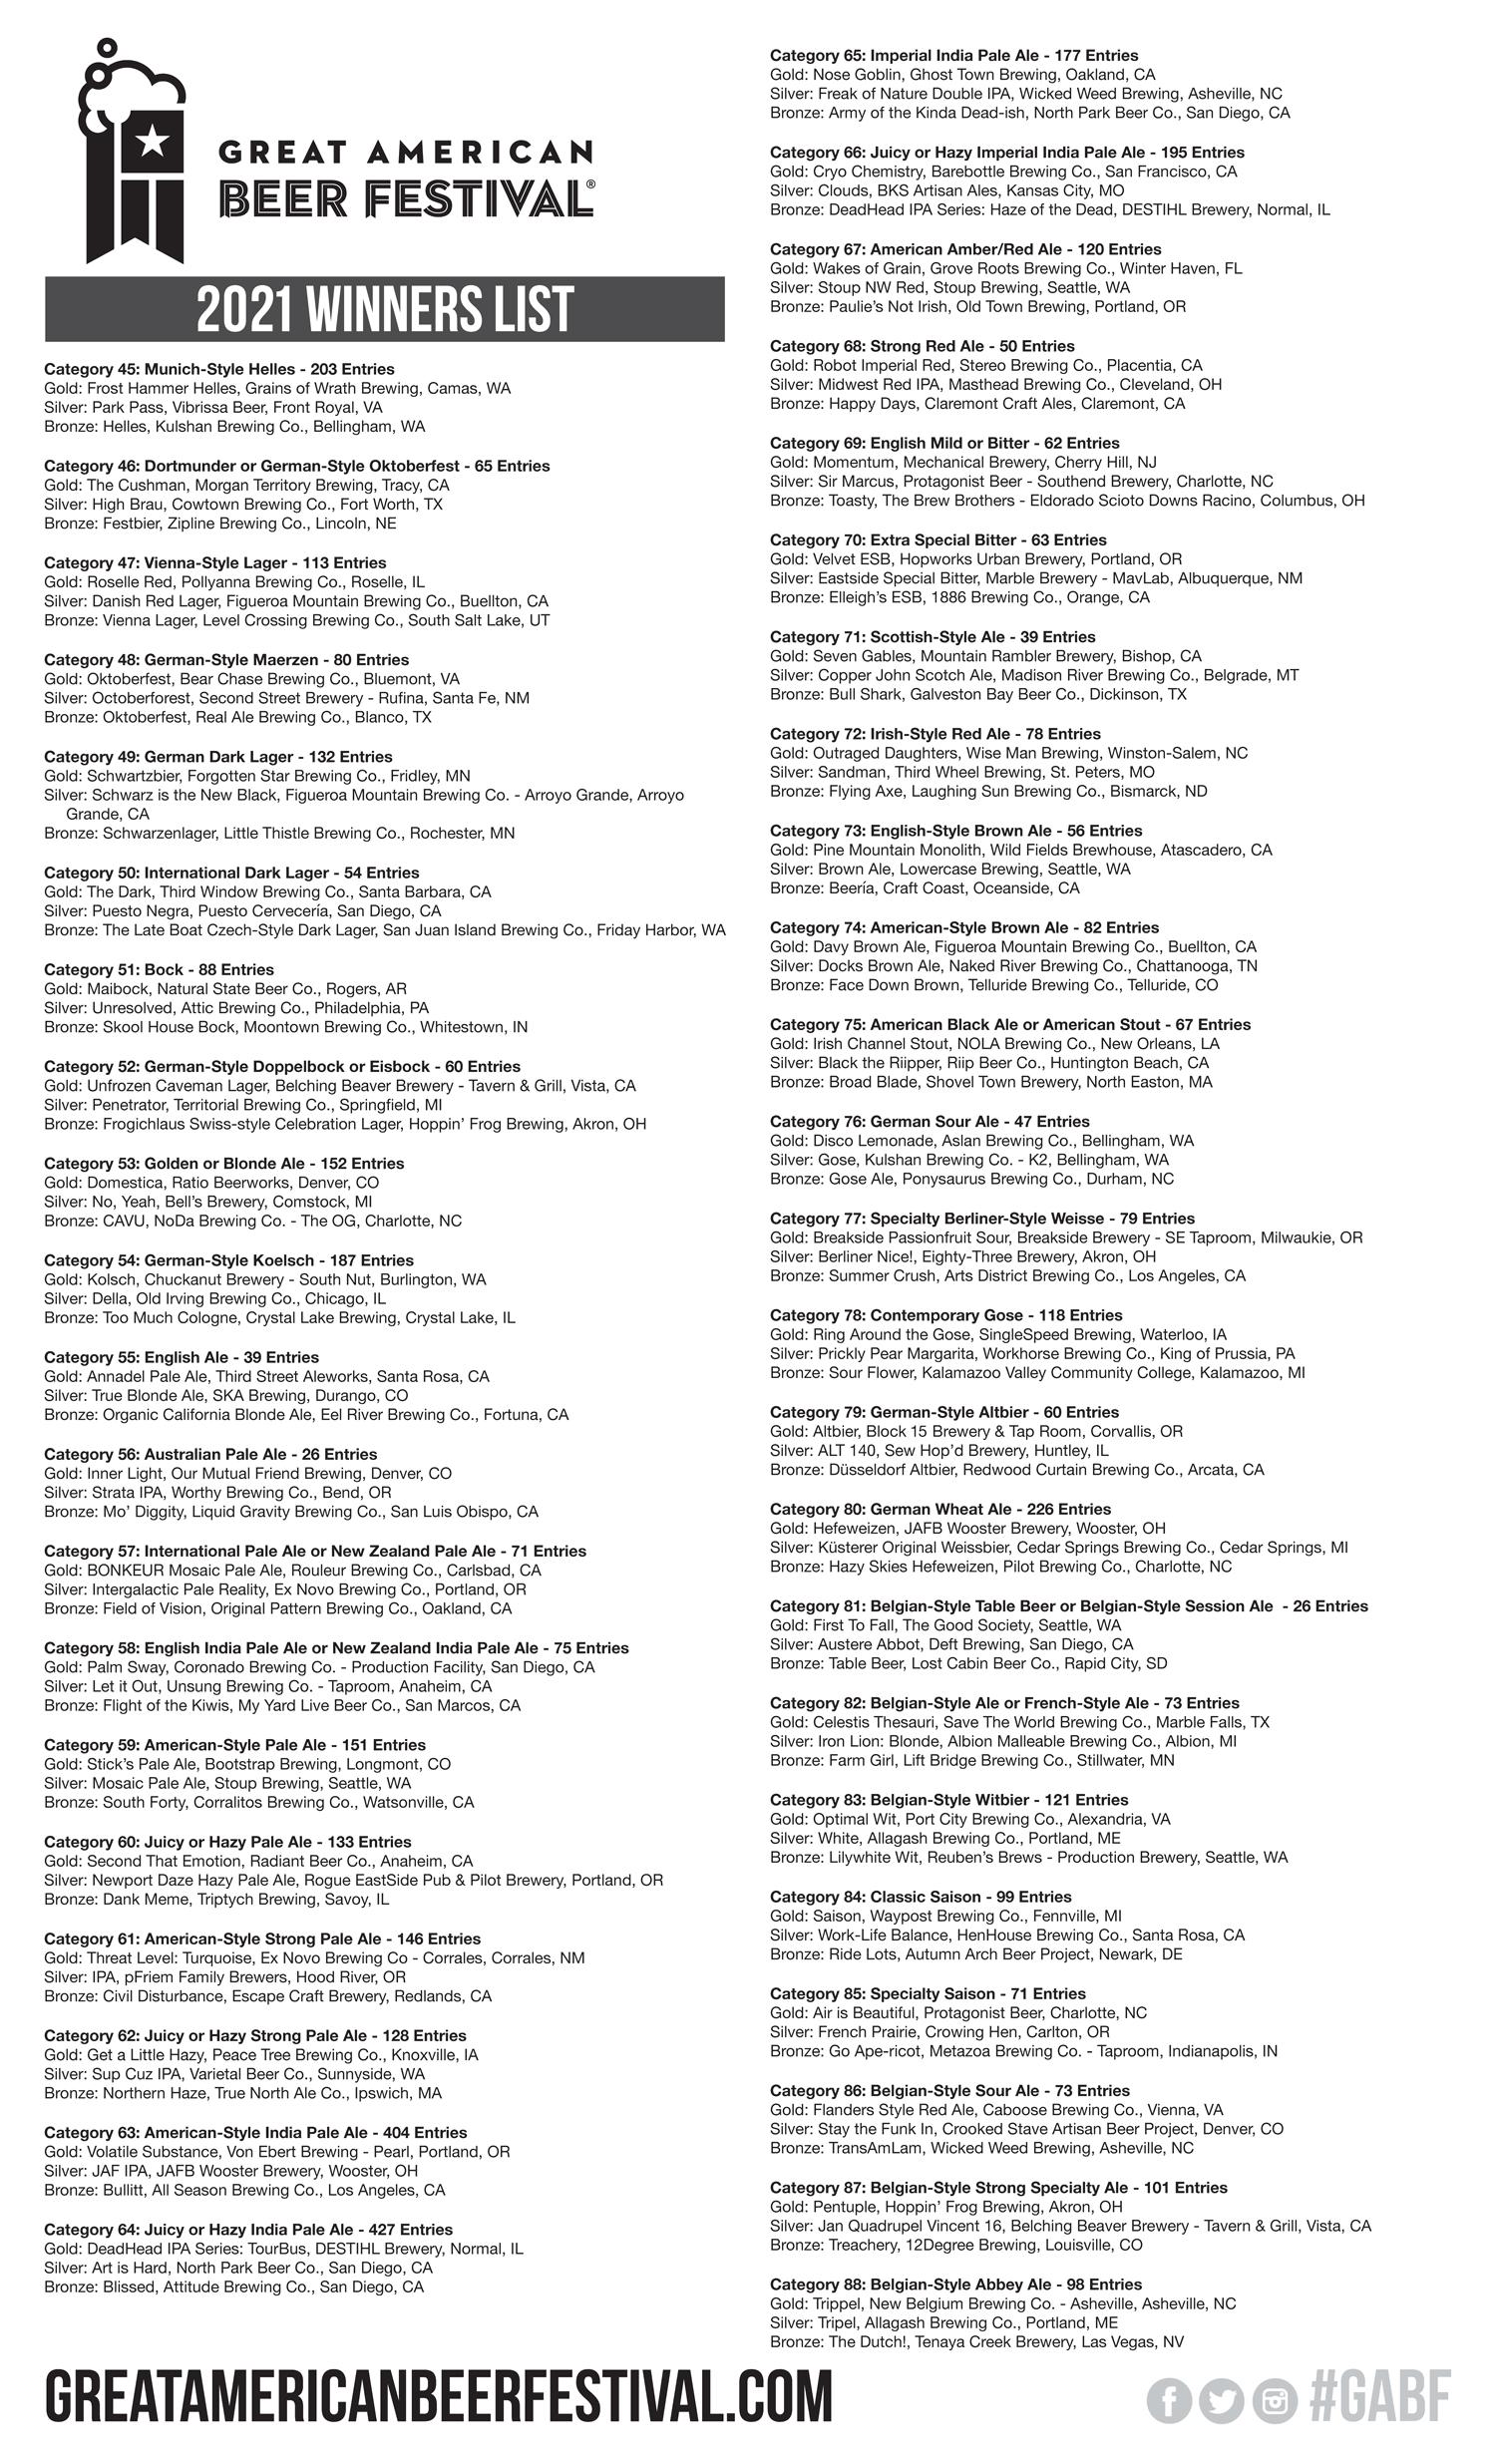 GABF 2021 Winners Page 2